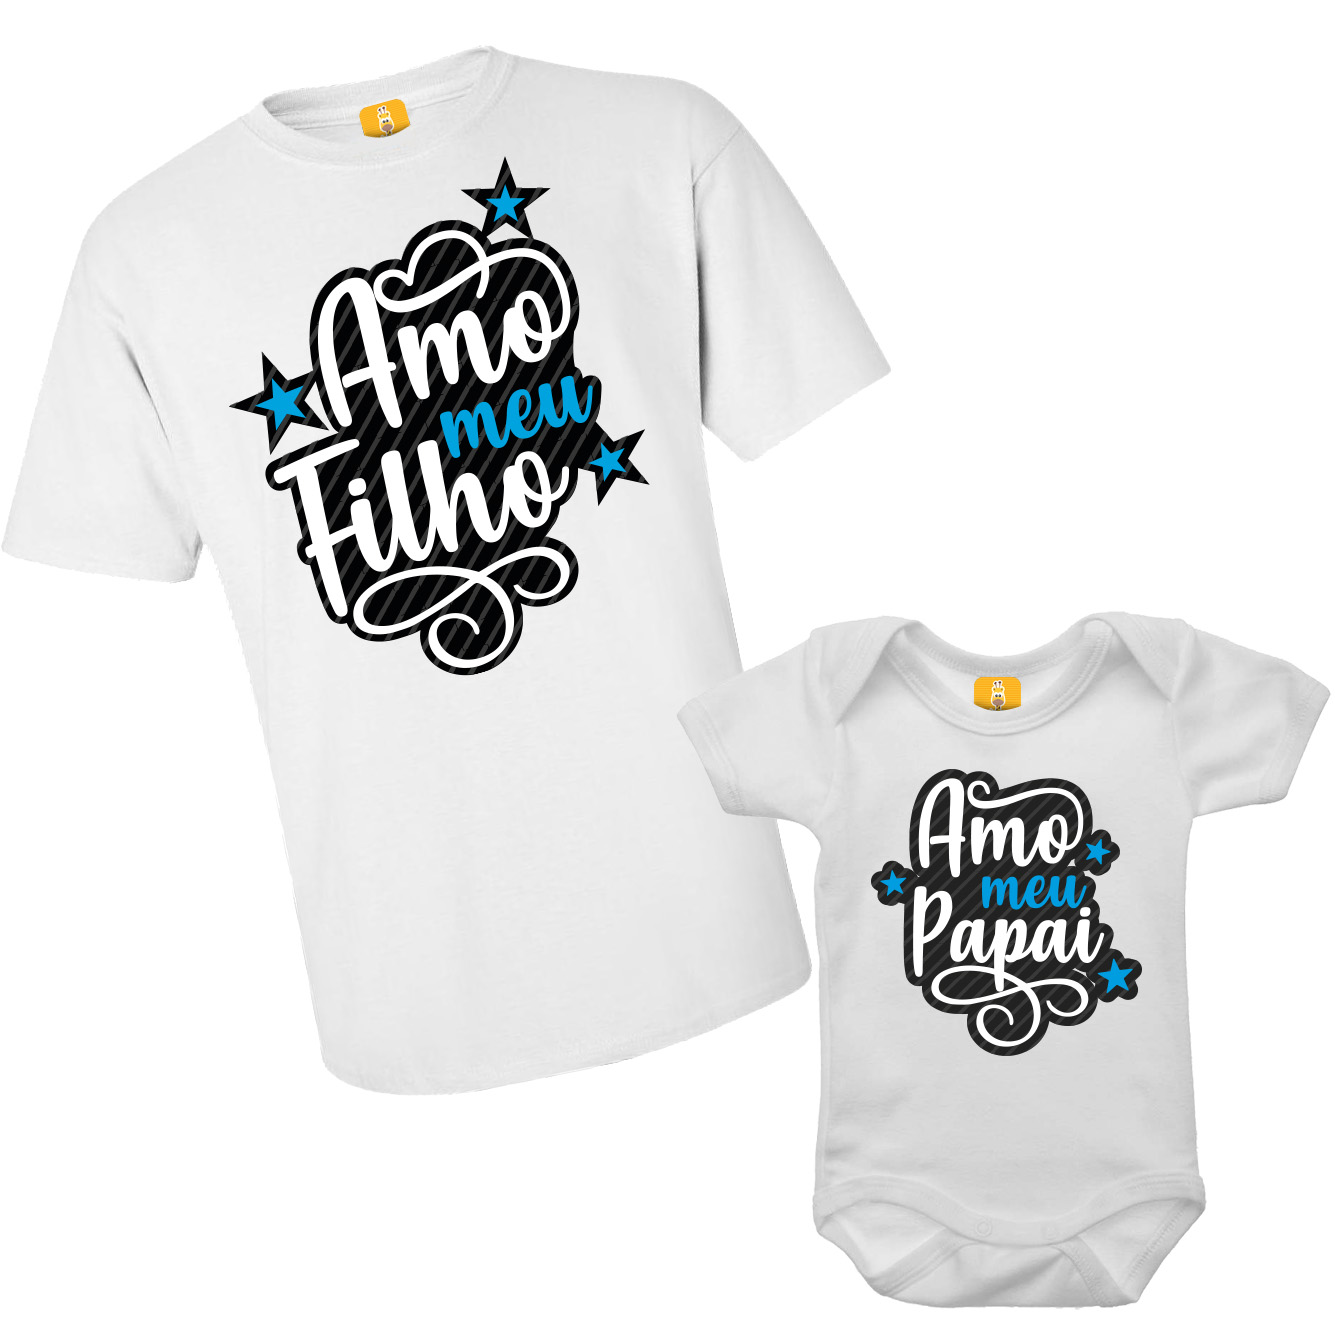 Kit Body e Camiseta - Tal Pai Tal Filha - Amo meu Papai - Branco